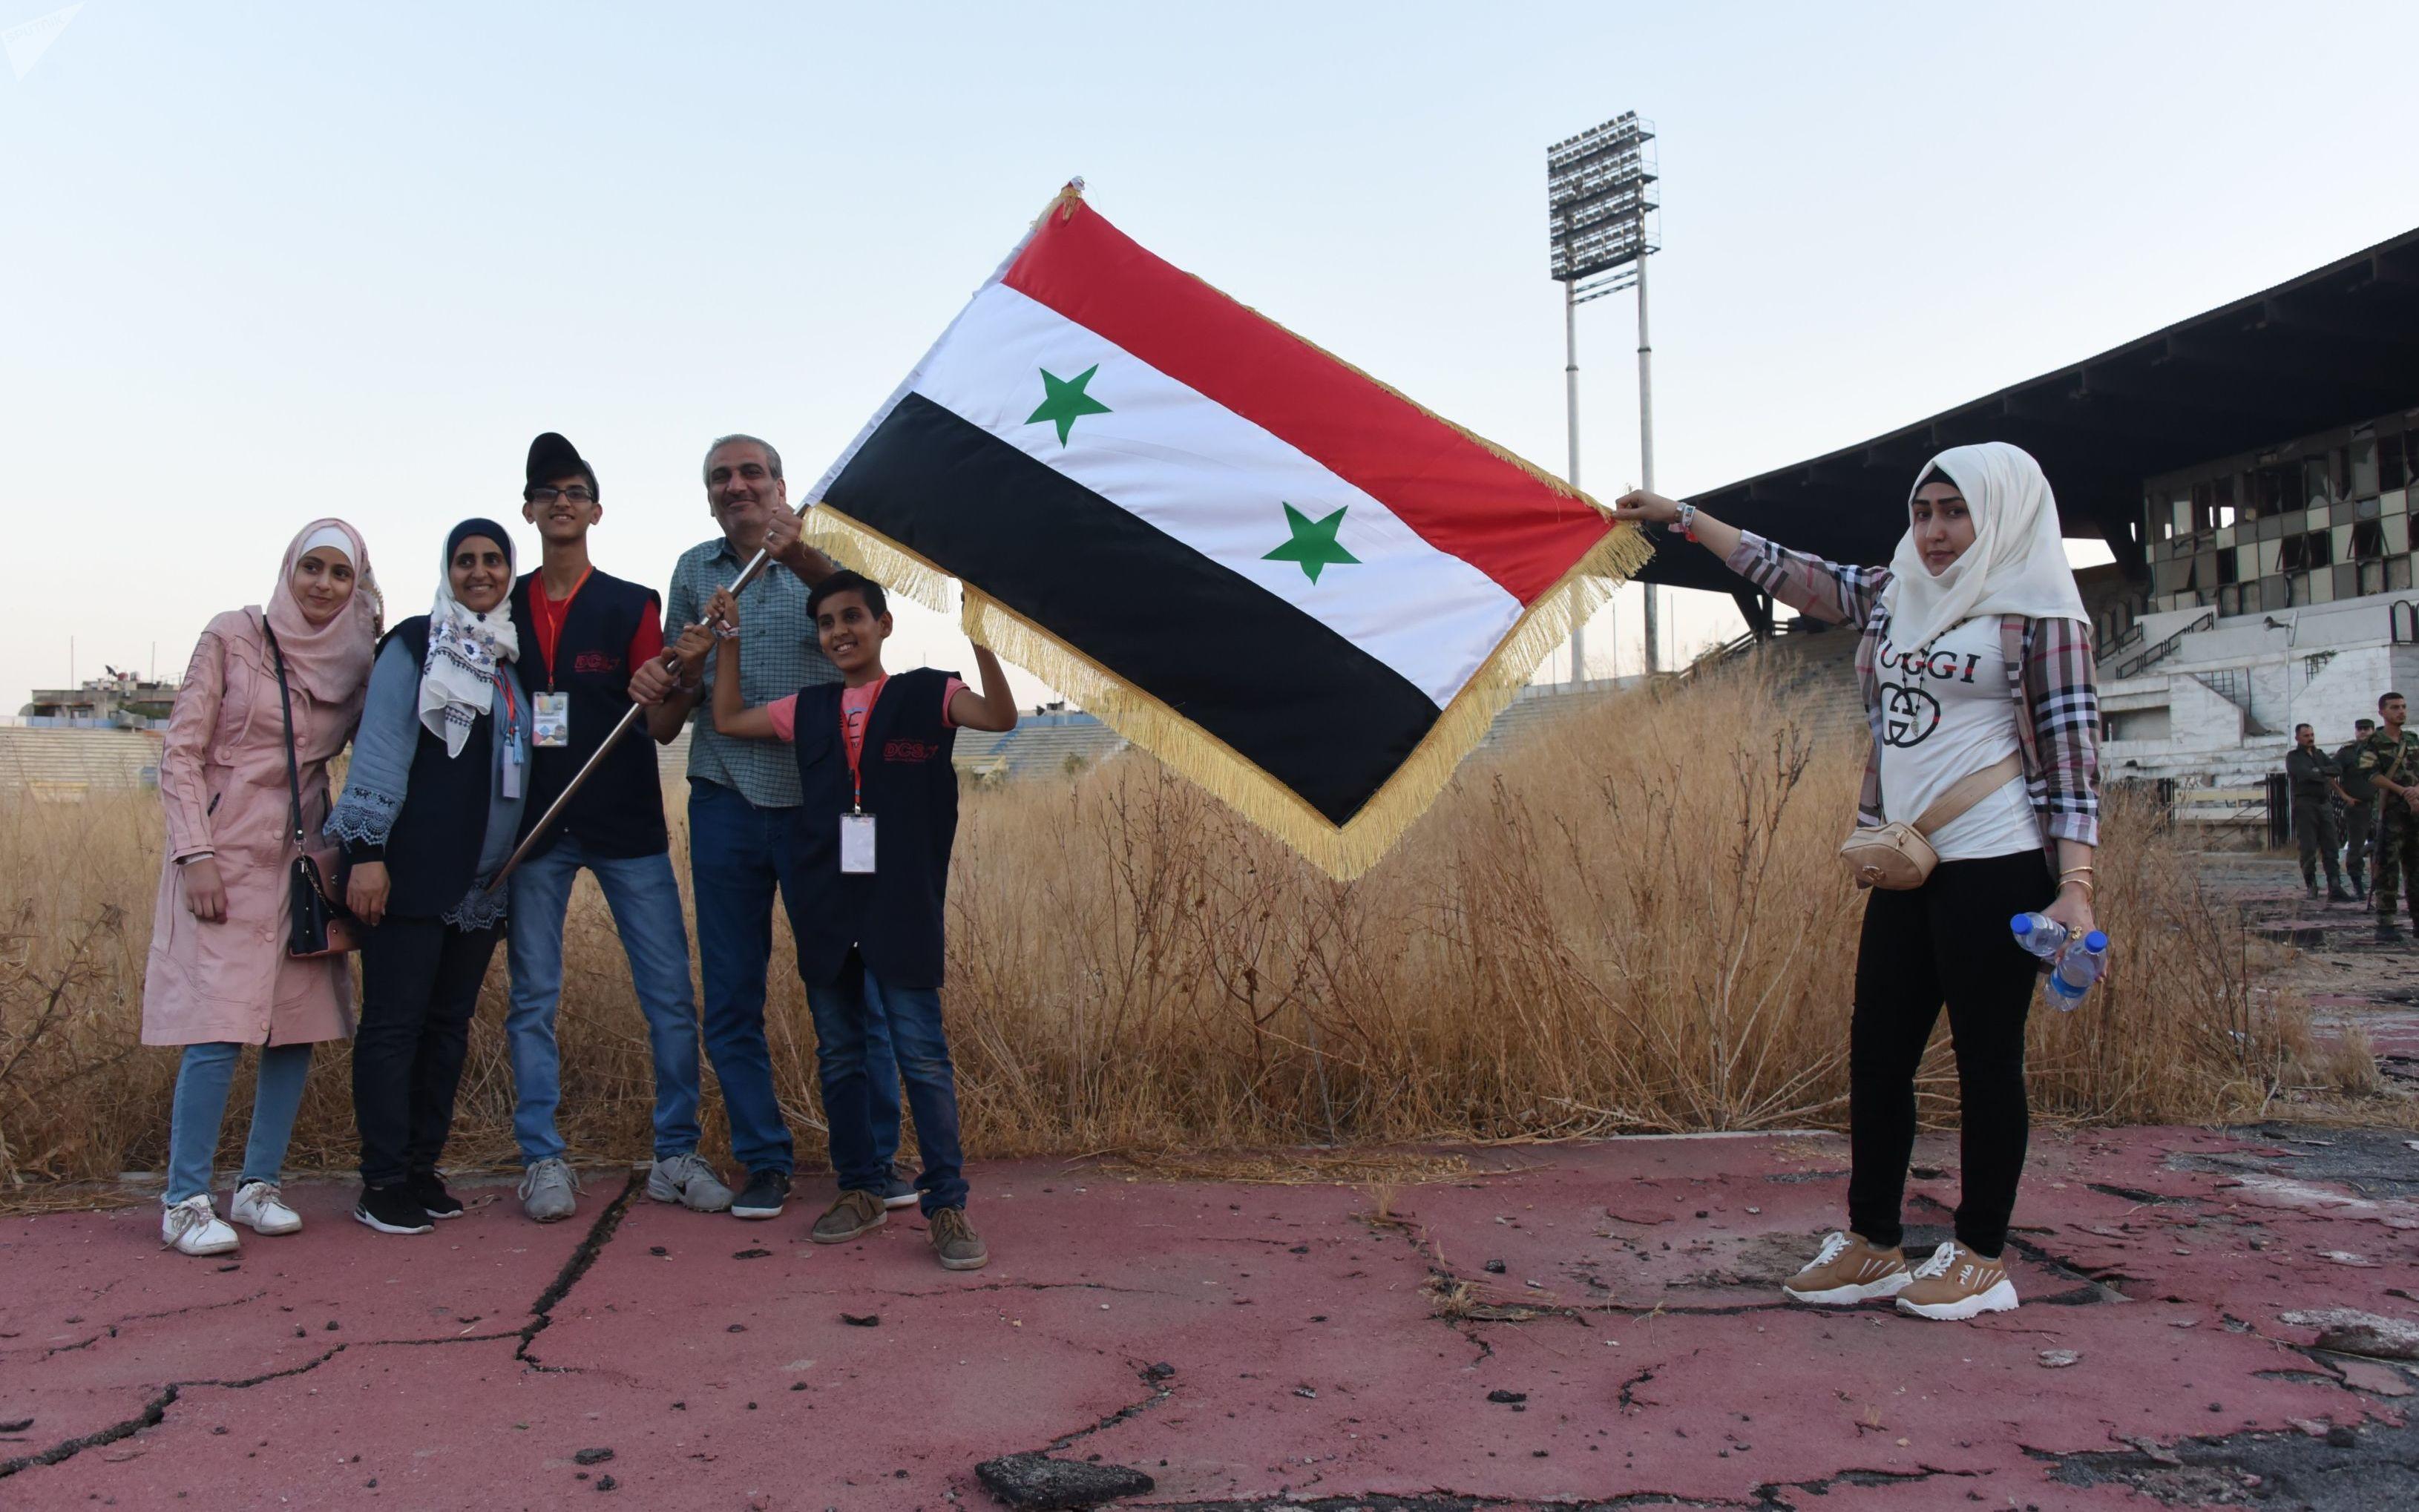 Альт: ذوو الاحتياجات الخاصة يحتفون باستعادة قلعة الذاكرة الرياضية لسوريا وأعرق ملاعبها